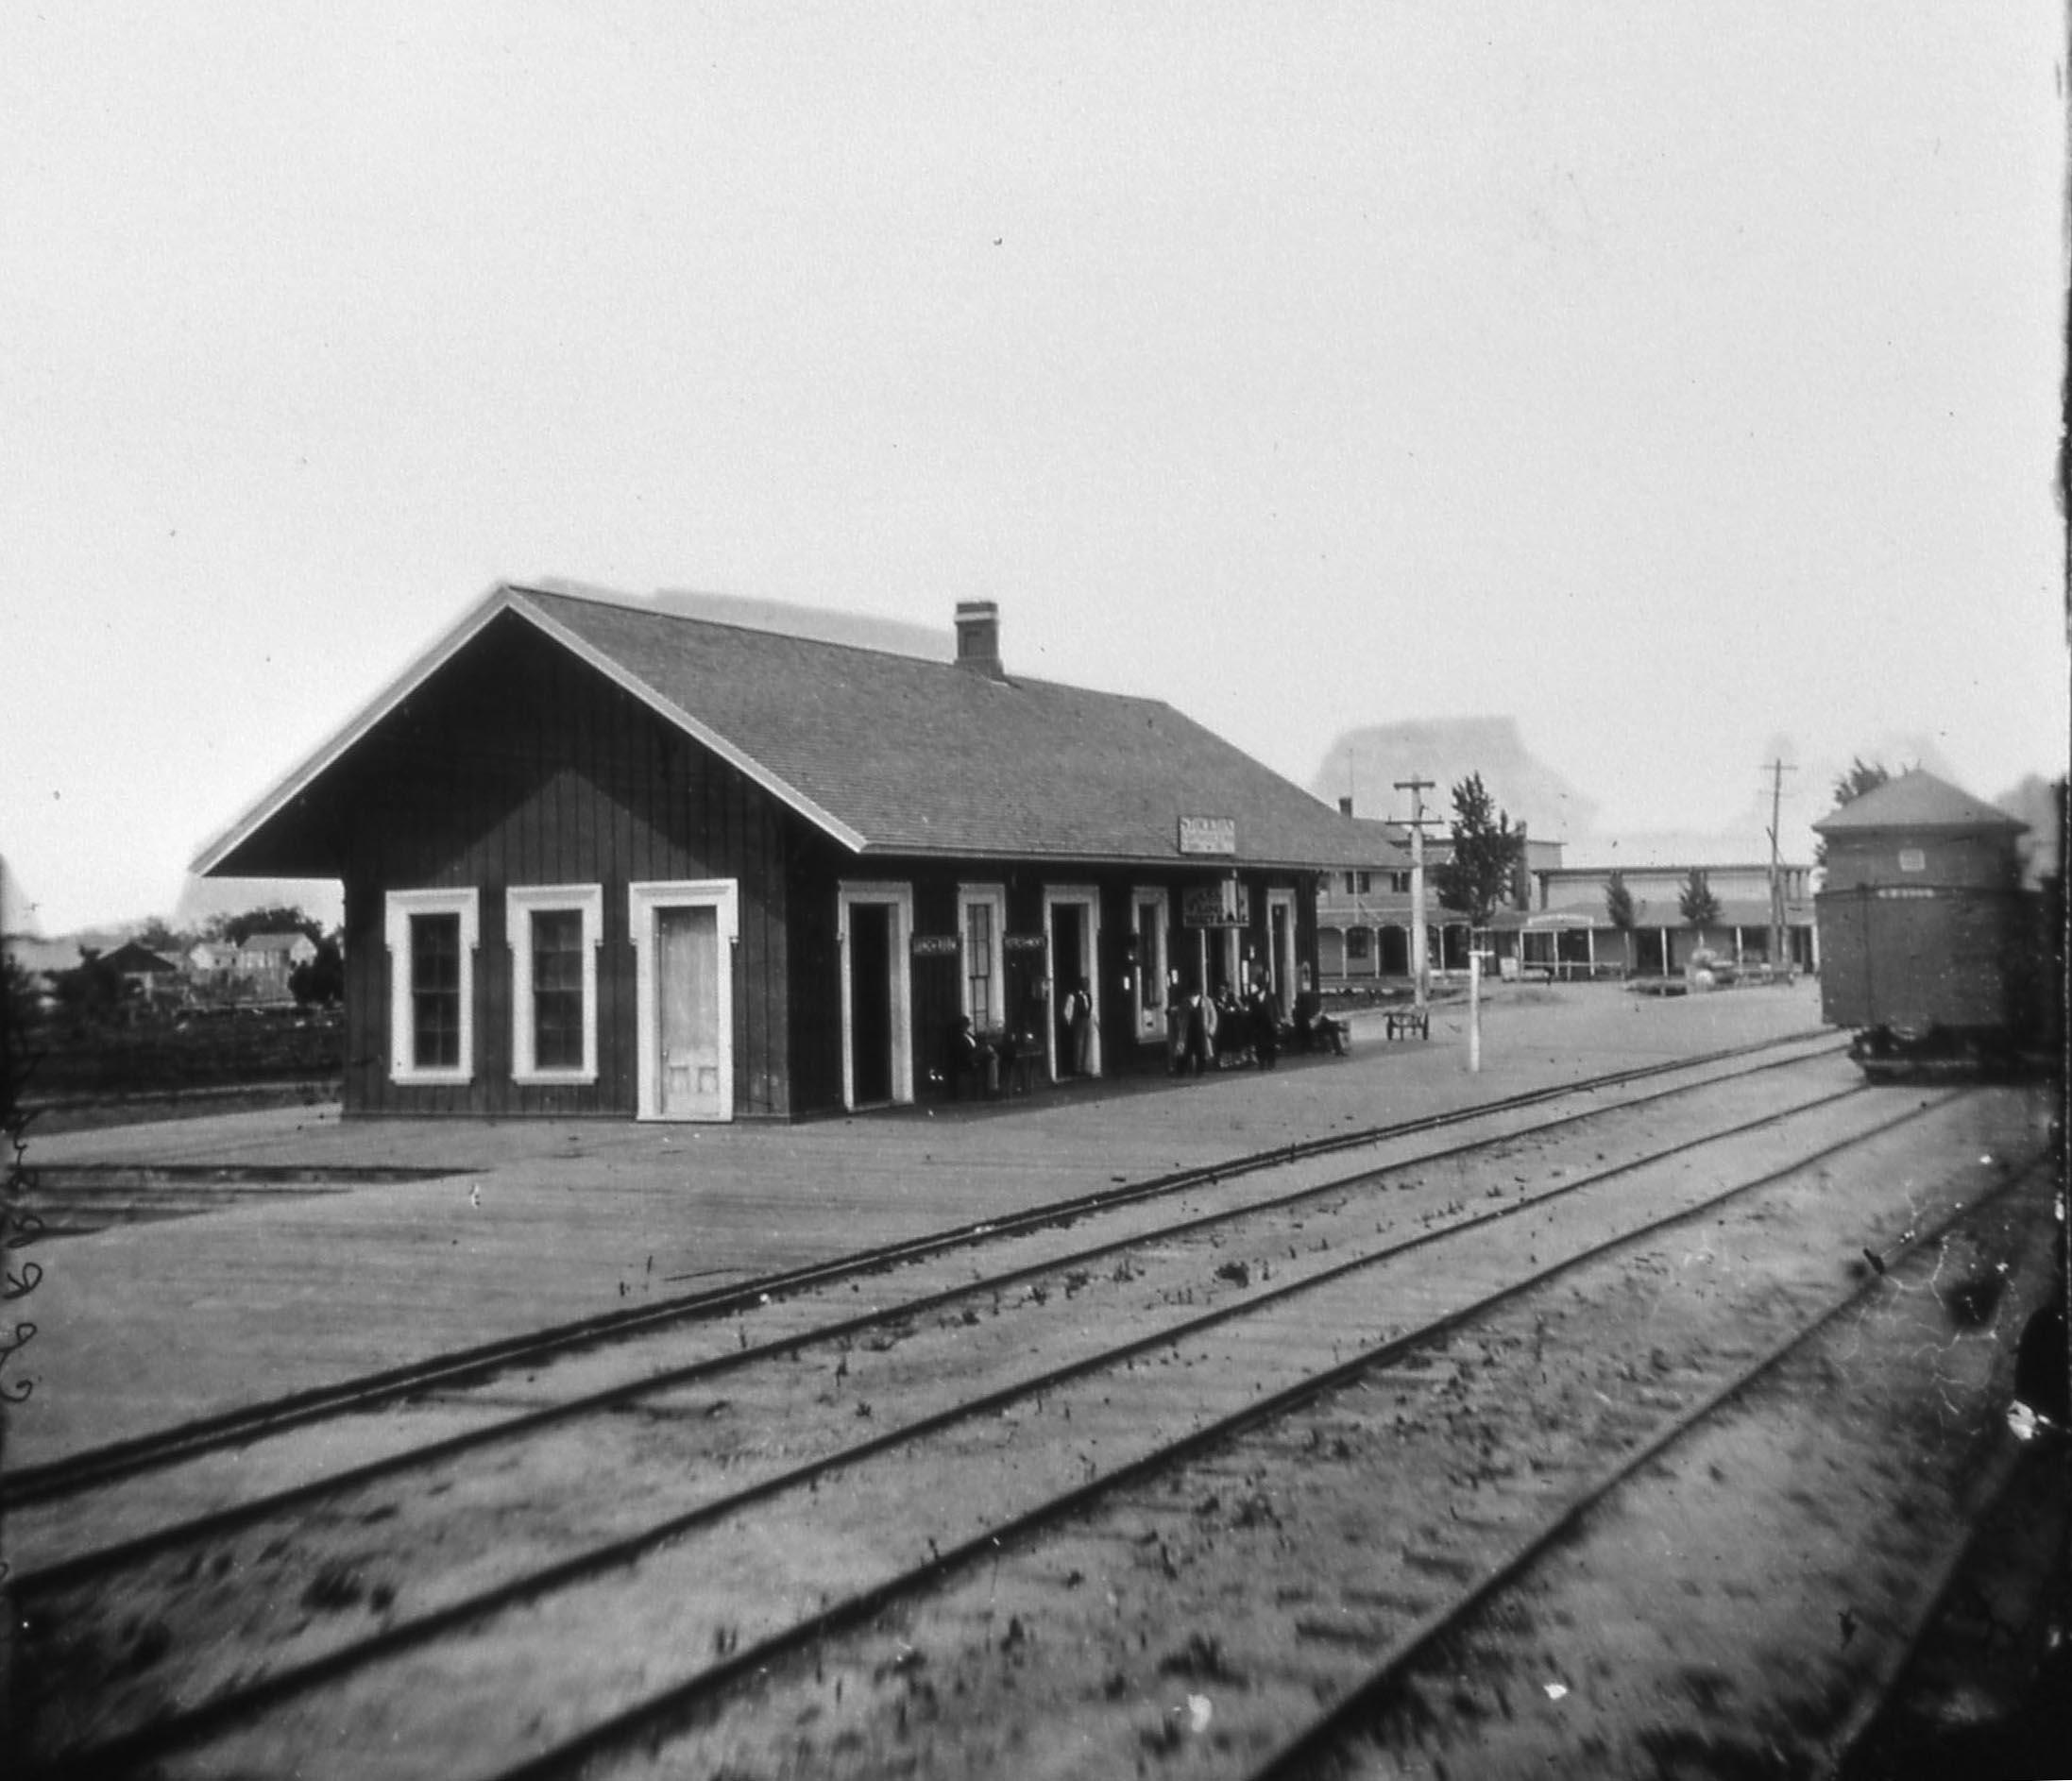 Spooner CPRR stockton depot